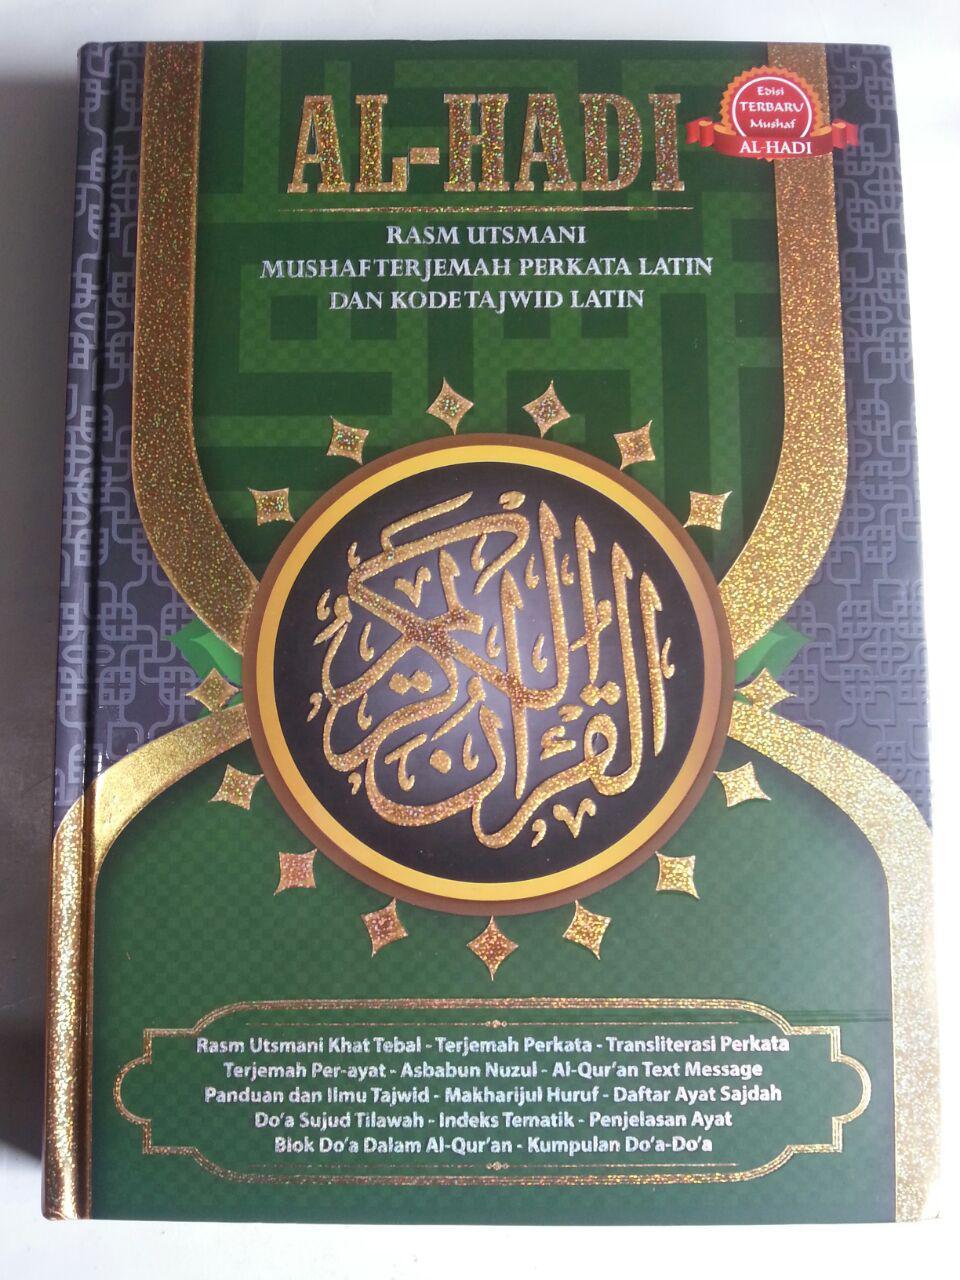 Al-Qur'an Al-Hadi Rasm Utsmani Mushaf Terjemah Perkata Tajwid A4 cover 2